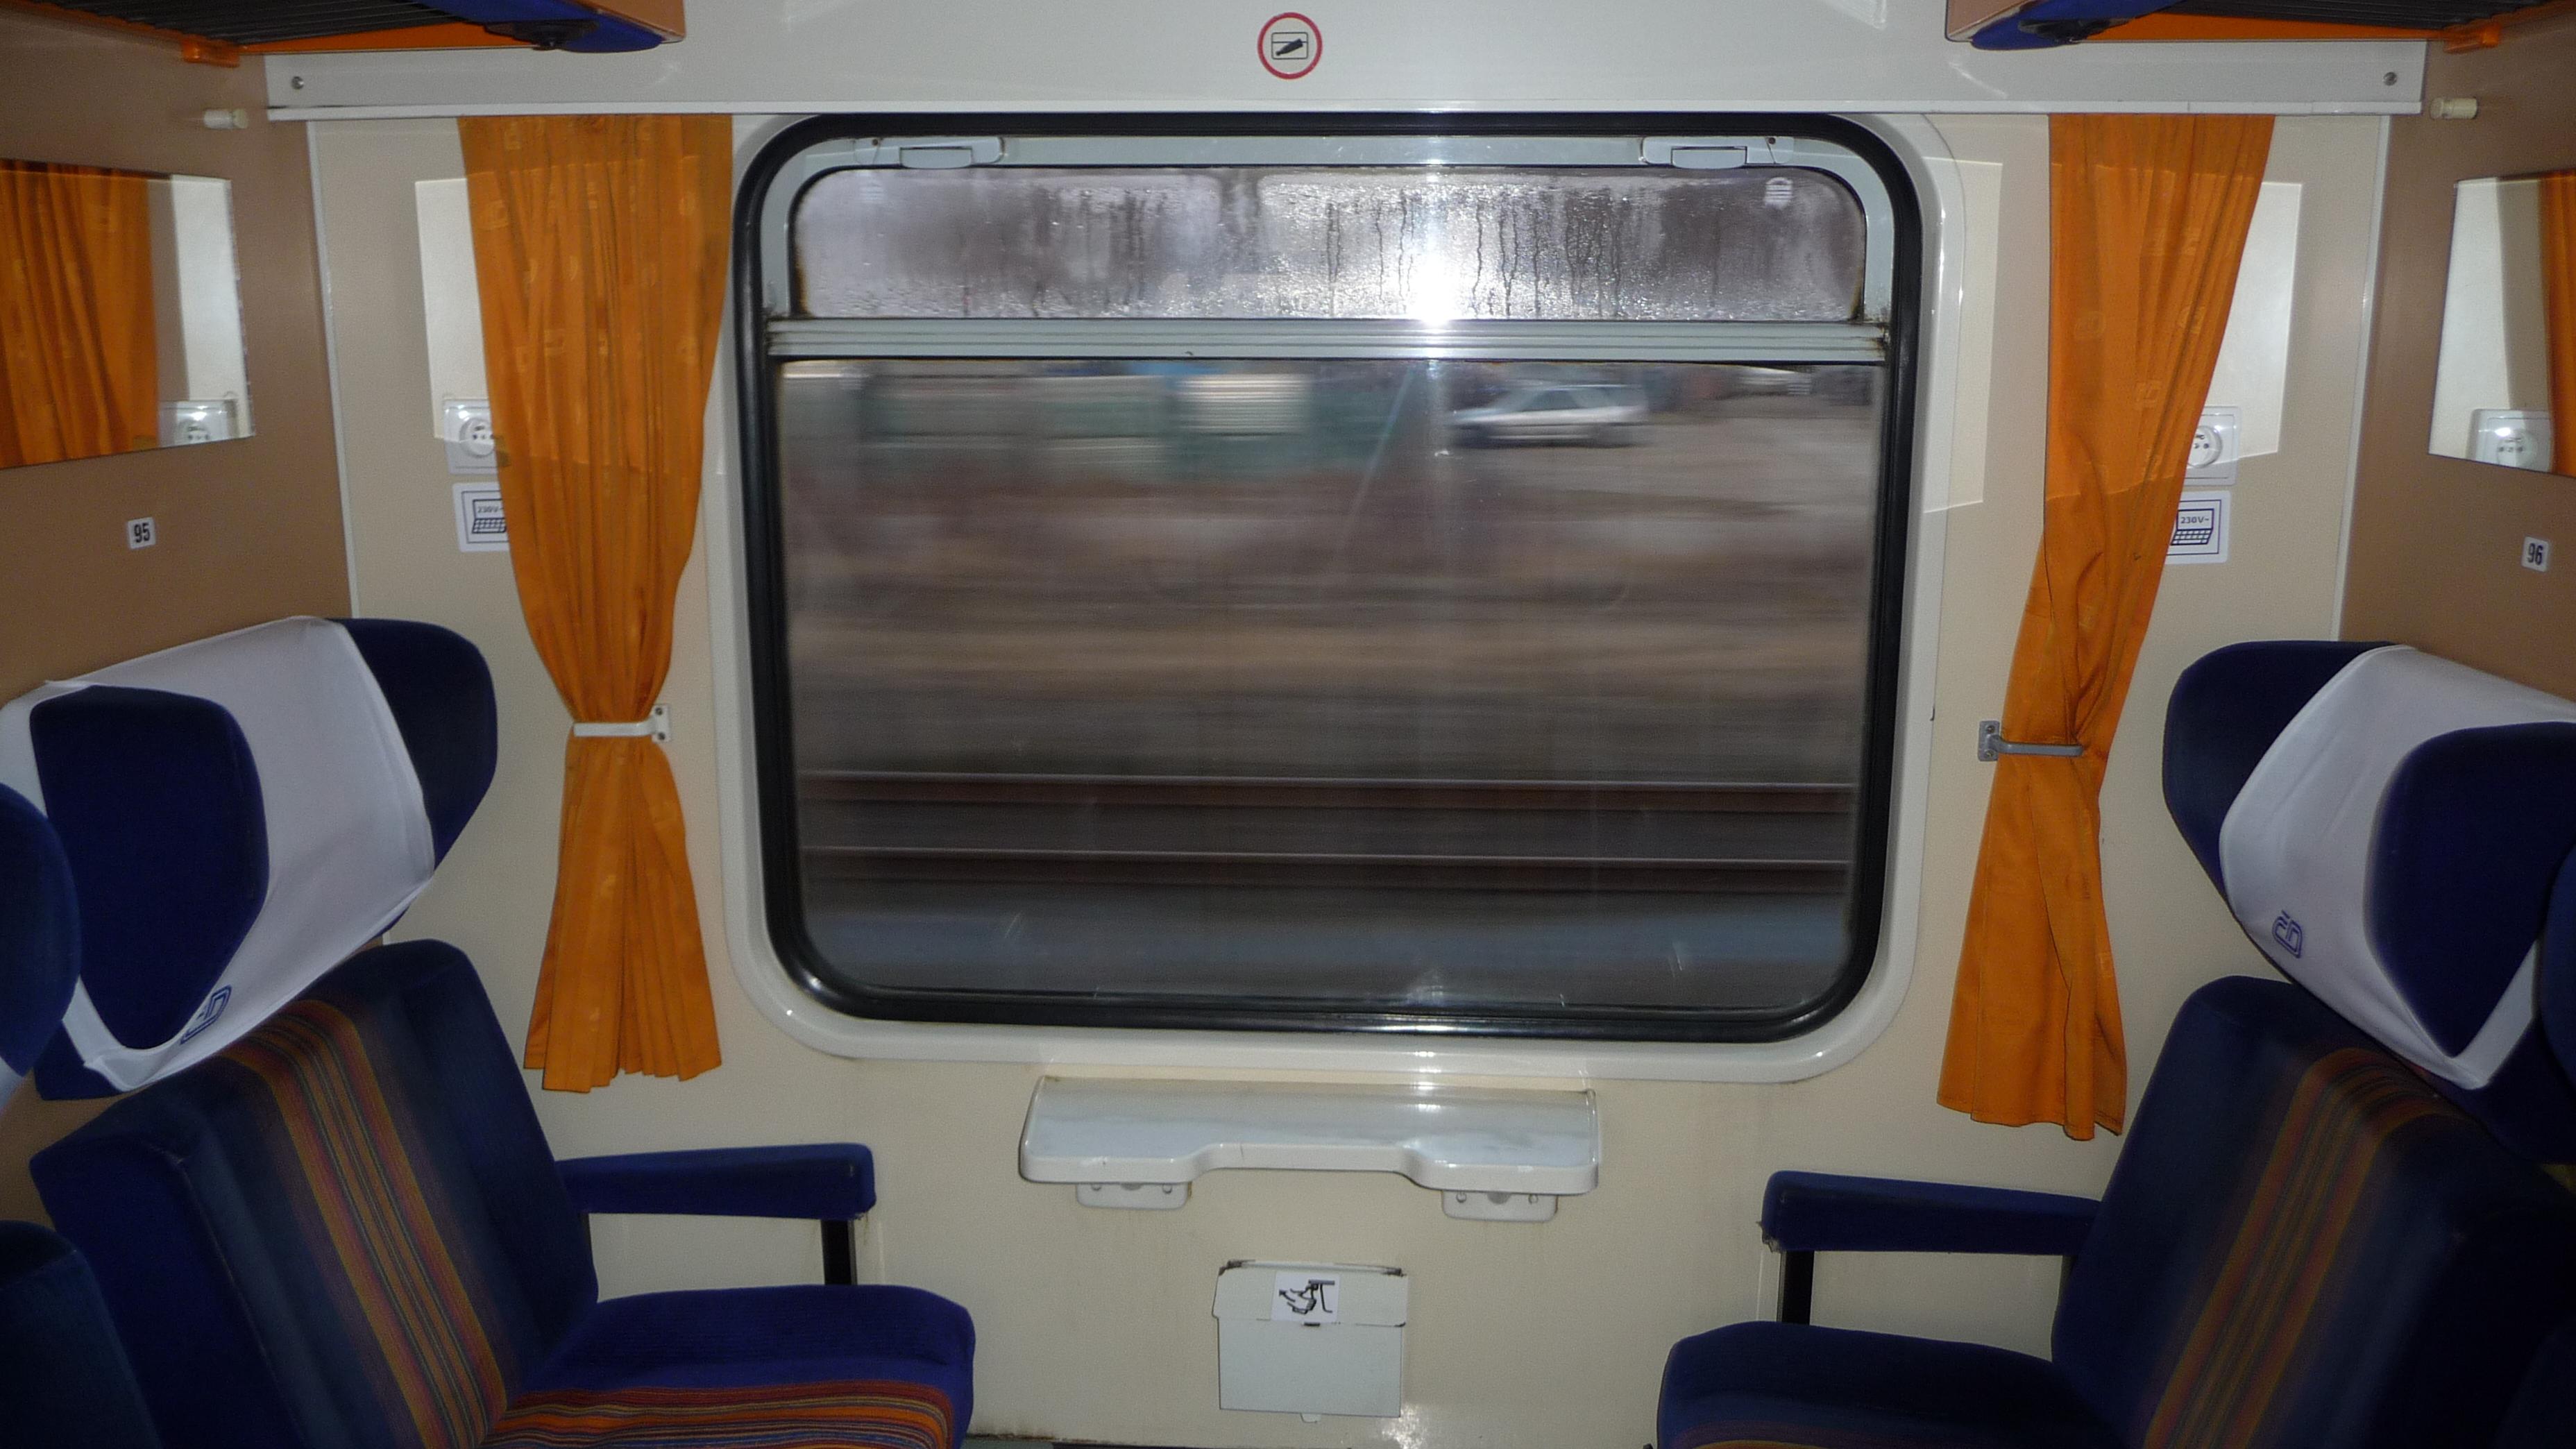 In train pic 26